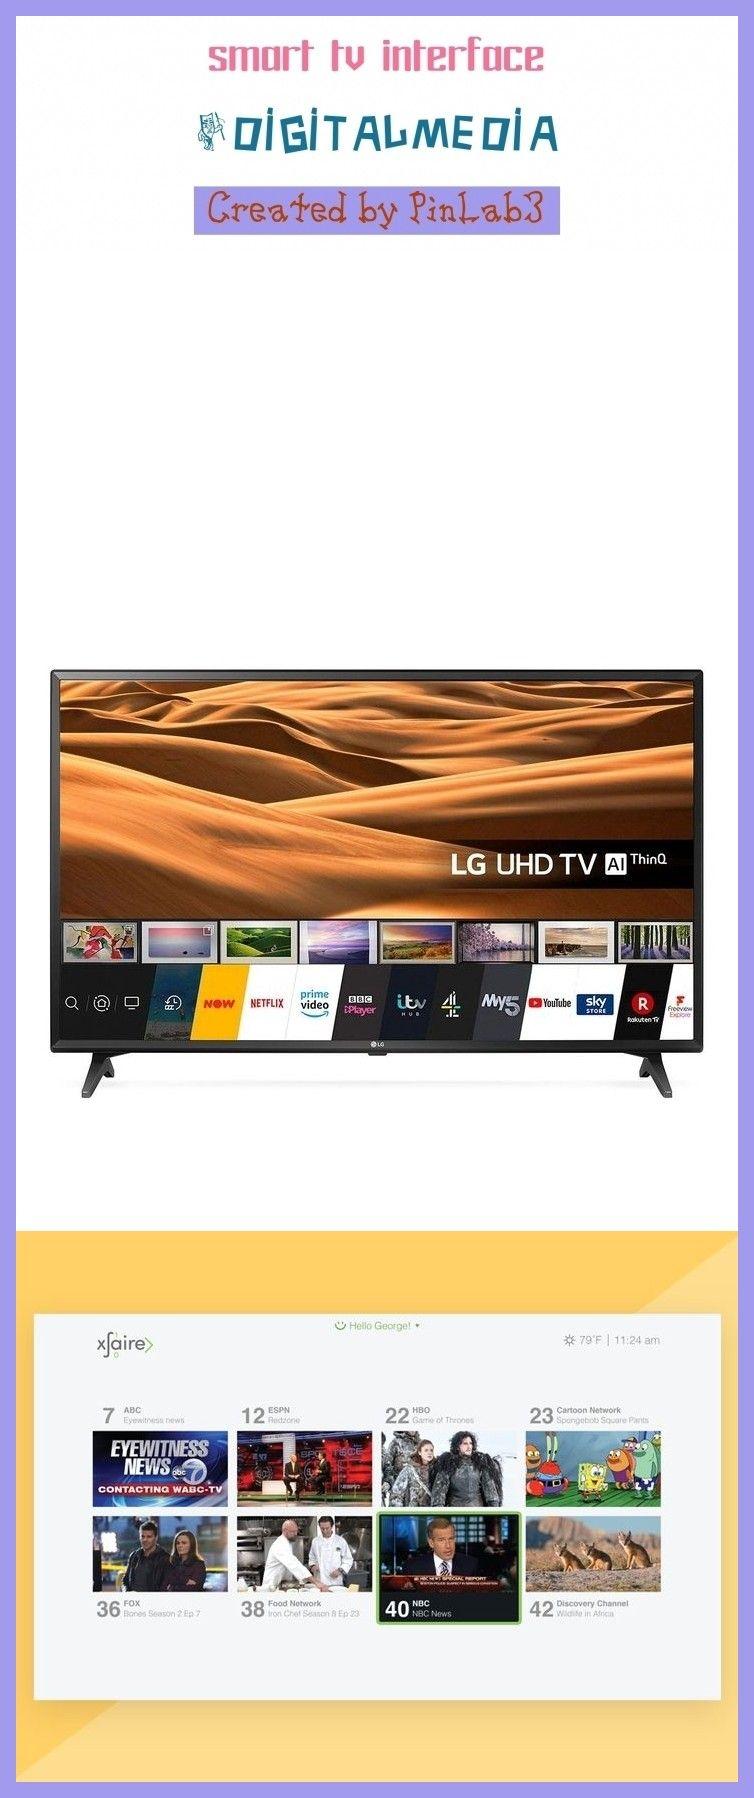 smart tv interface in 2020 Vizio smart tv, Smart tv, Tv